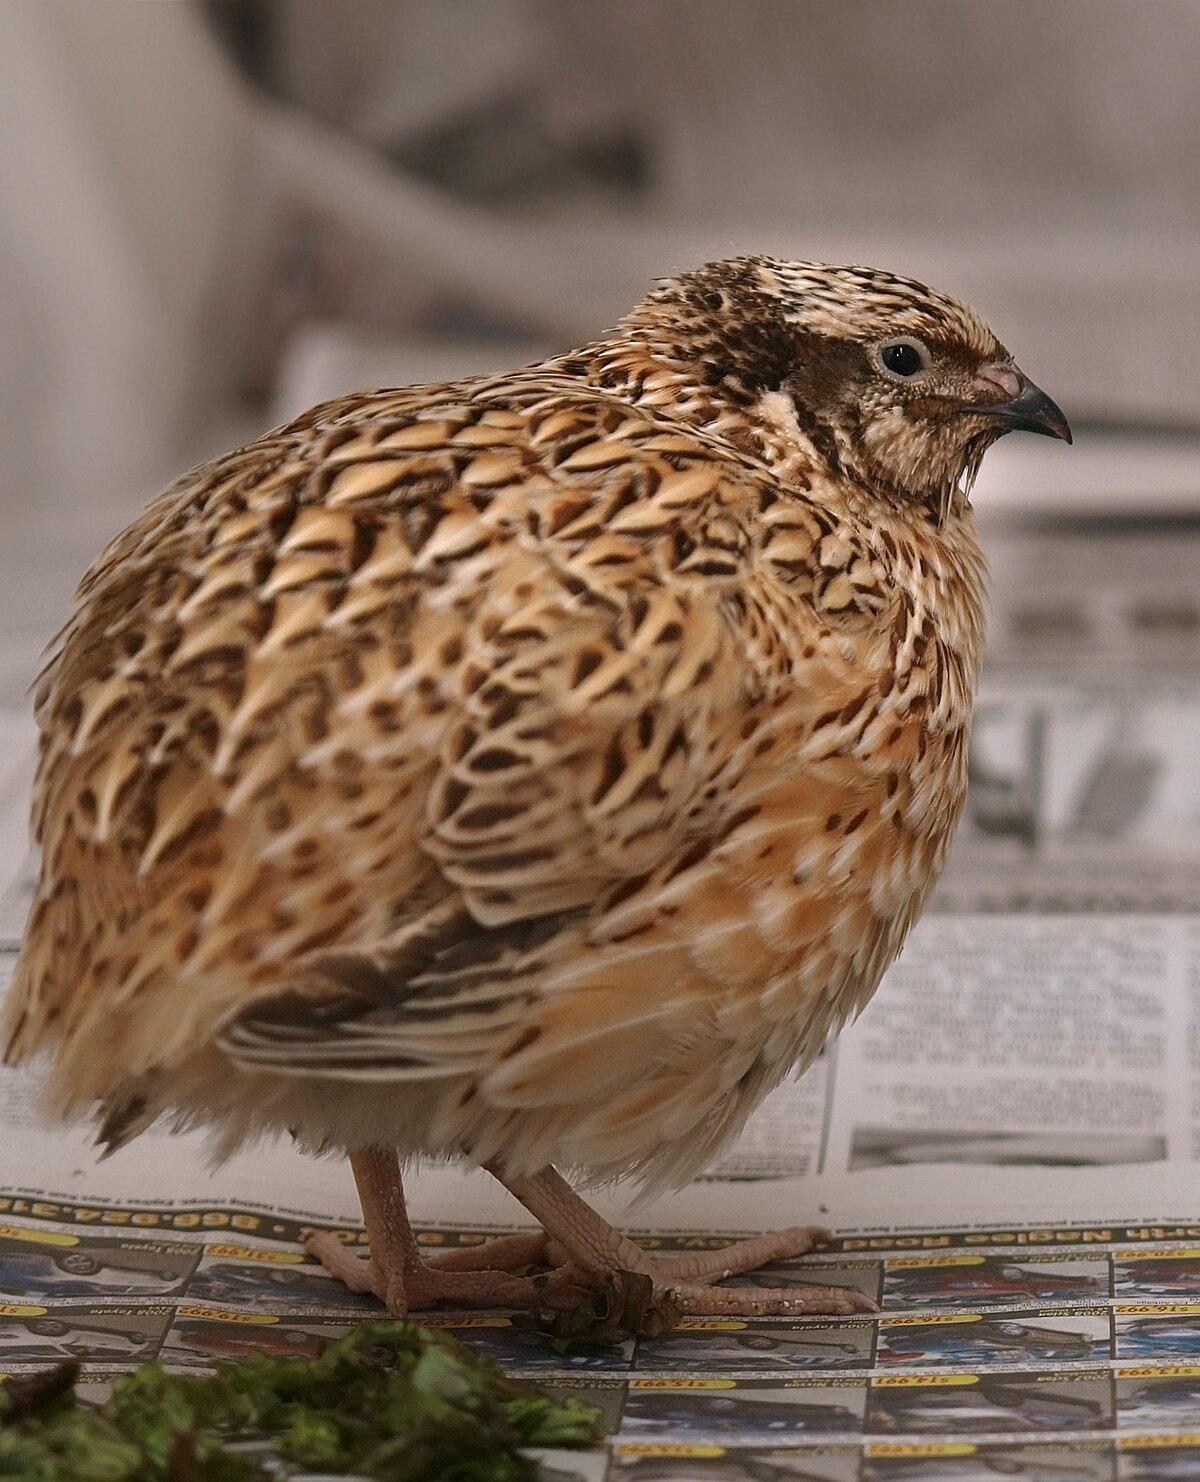 Japanese quail - Wikipedia